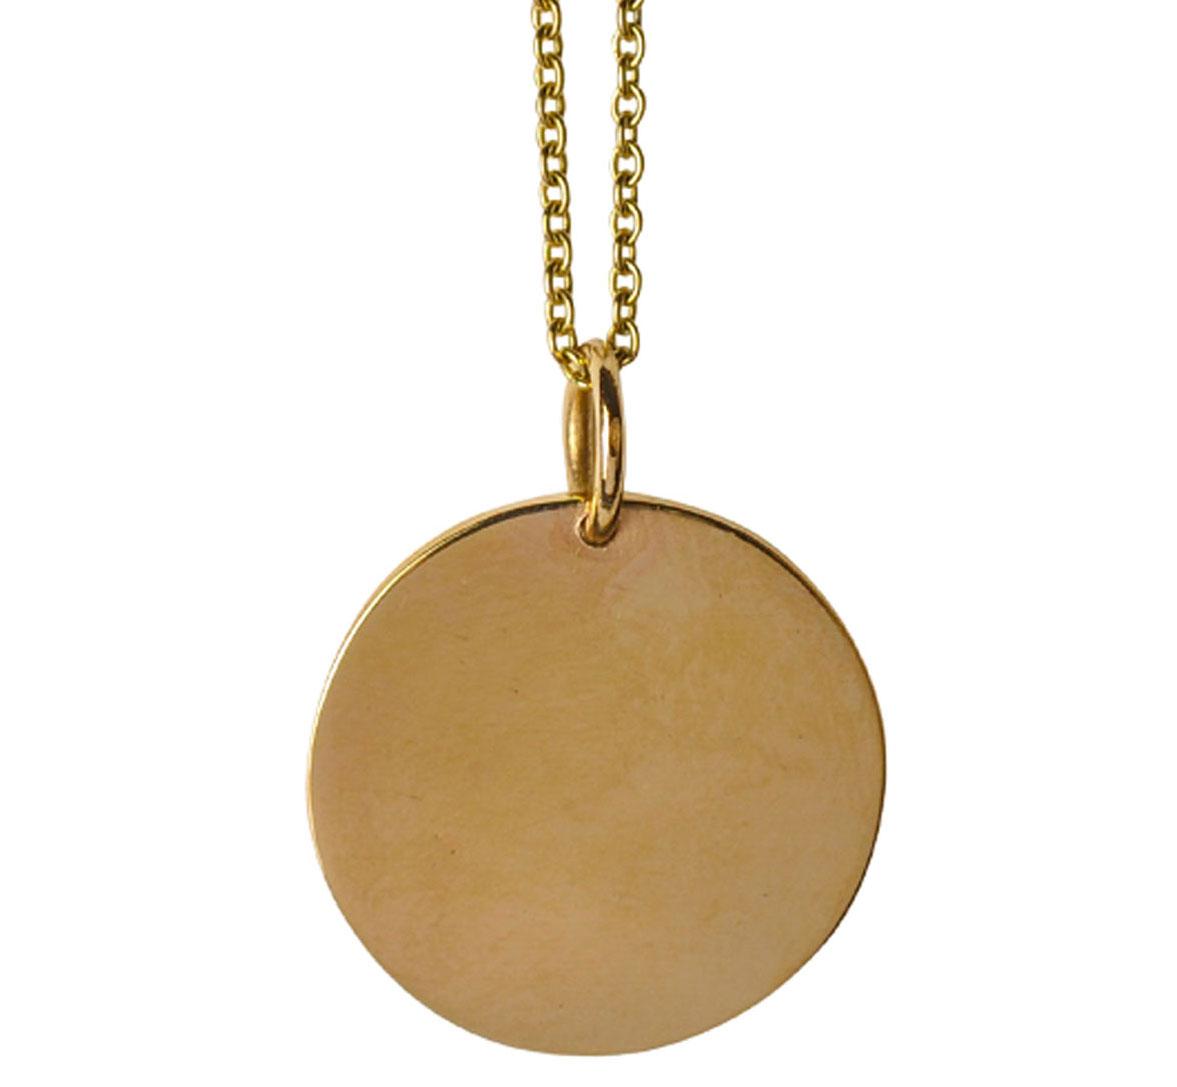 Large plain disc pendant necklace lindsay pearson large plain disc pendant necklace aloadofball Choice Image